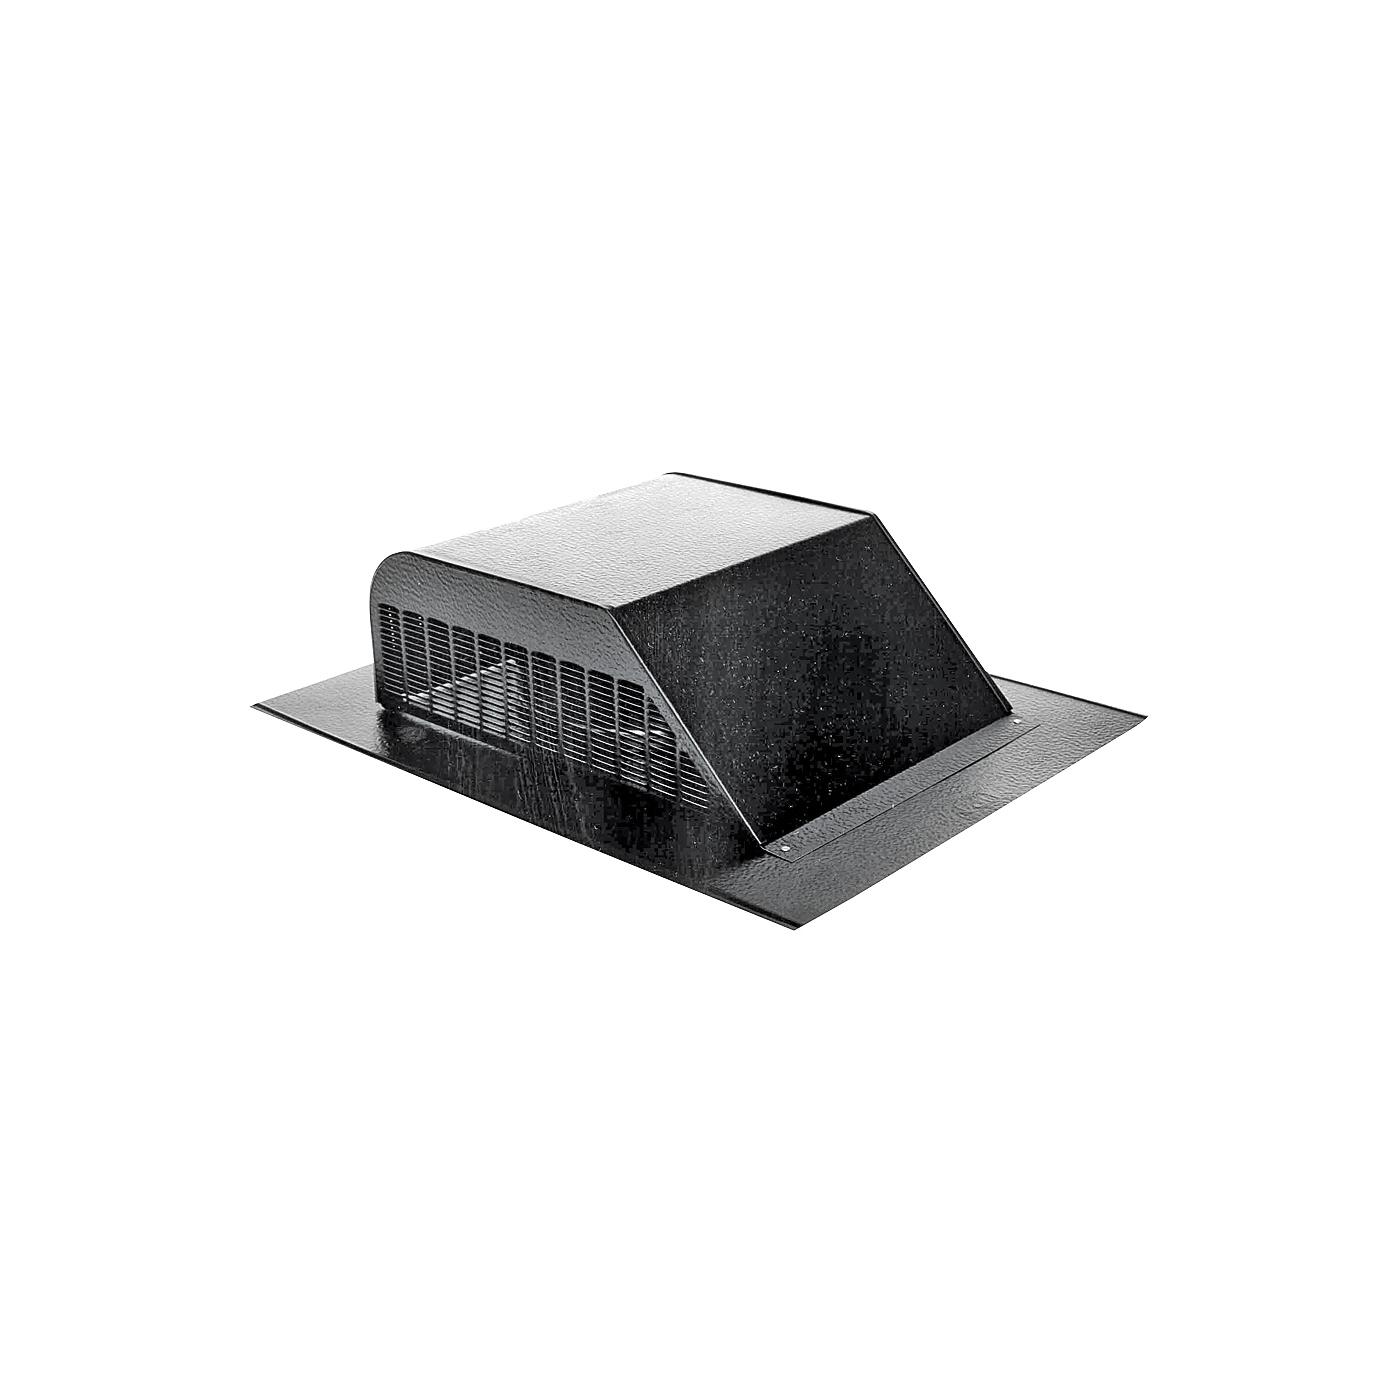 Picture of LOMANCO LomanCool 750B Static Vent, 16 in OAW, 50 sq-in Net Free Ventilating Area, Aluminum, Black